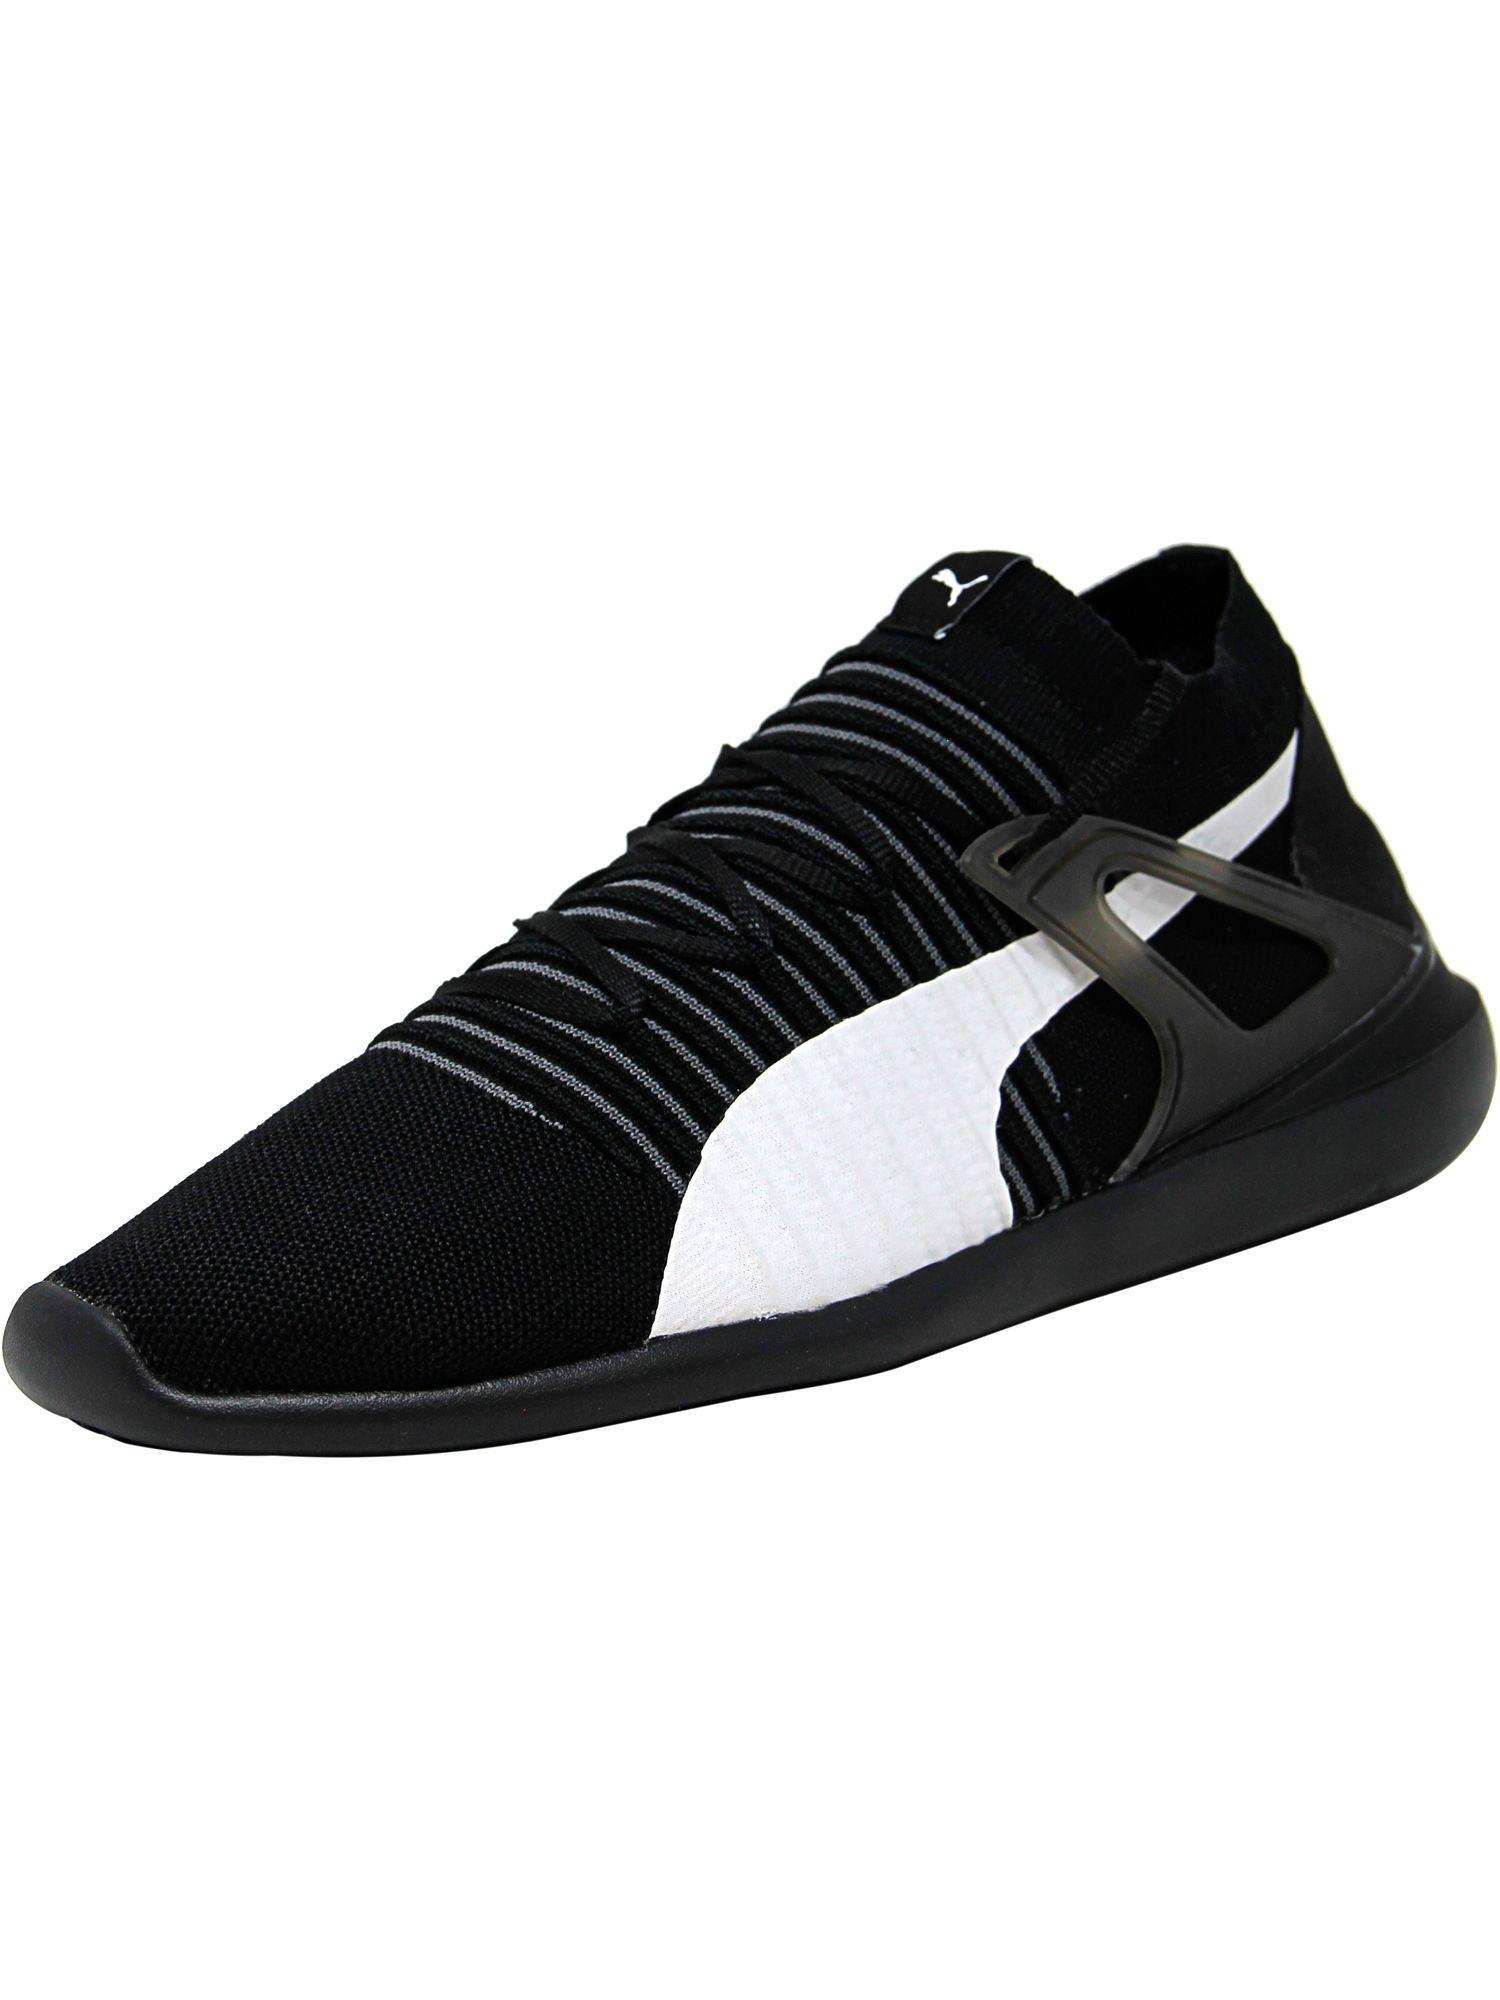 ecc02dd8b PUMA PUMA MEN'S FERRARI EVO CAT SOCK LACE ANKLE-HIGH FABRIC FASHION SNEAKER.  #puma #shoes